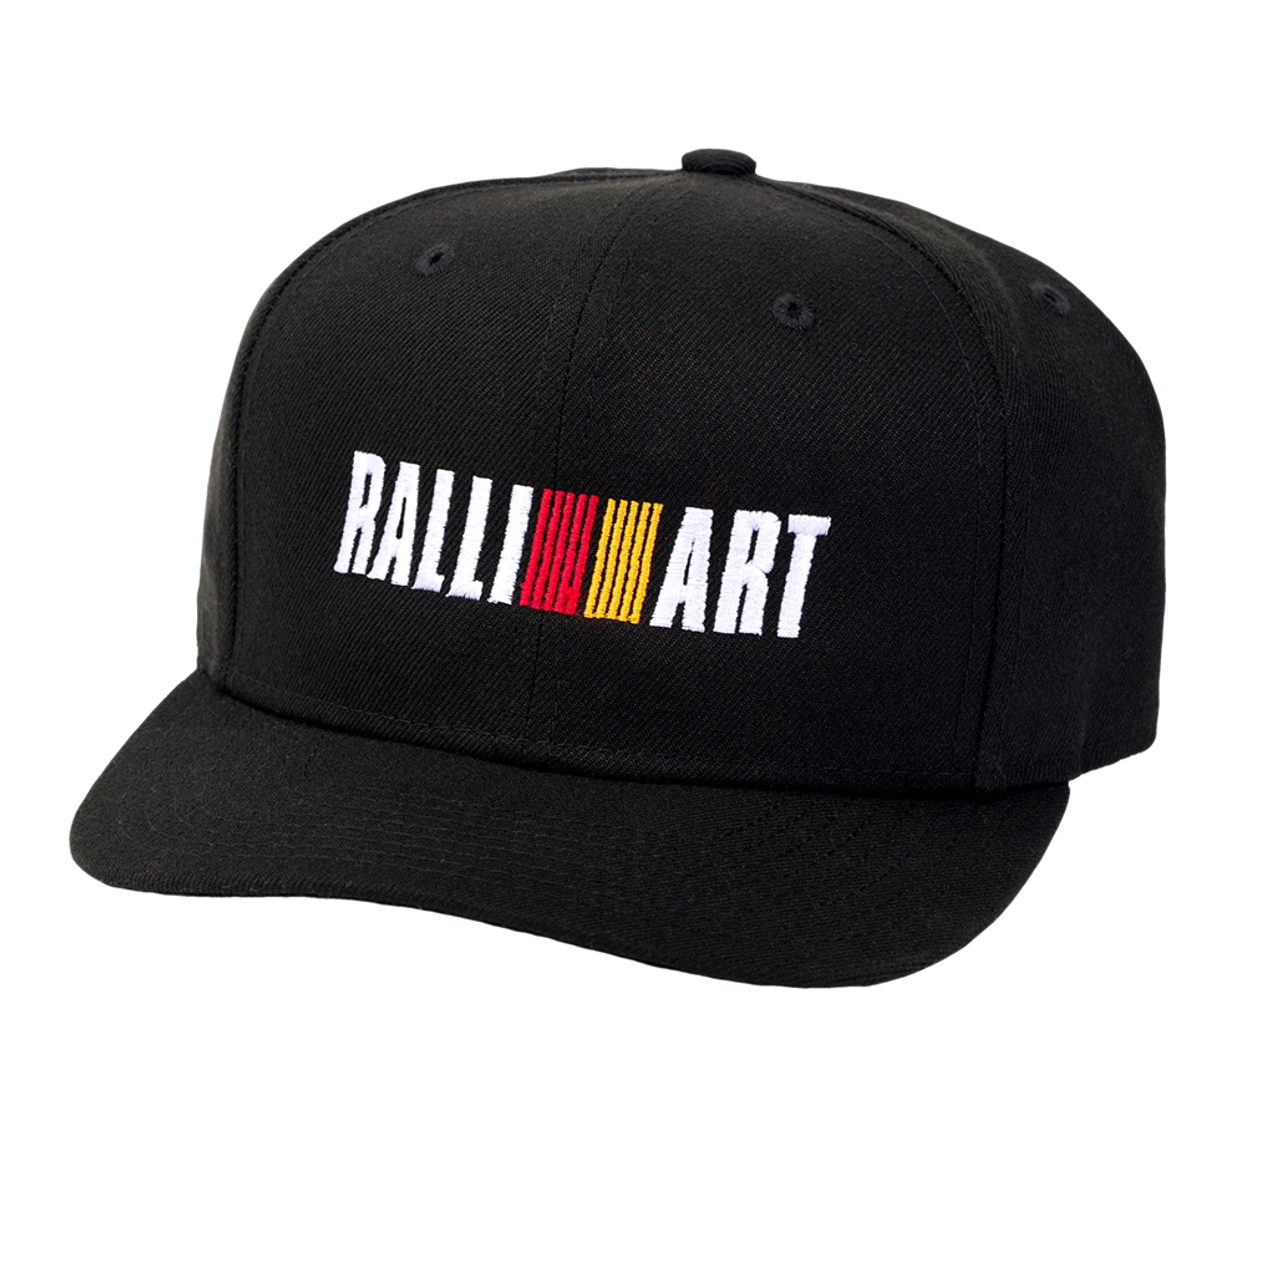 Ralliart New Era Classic Snapback Hat